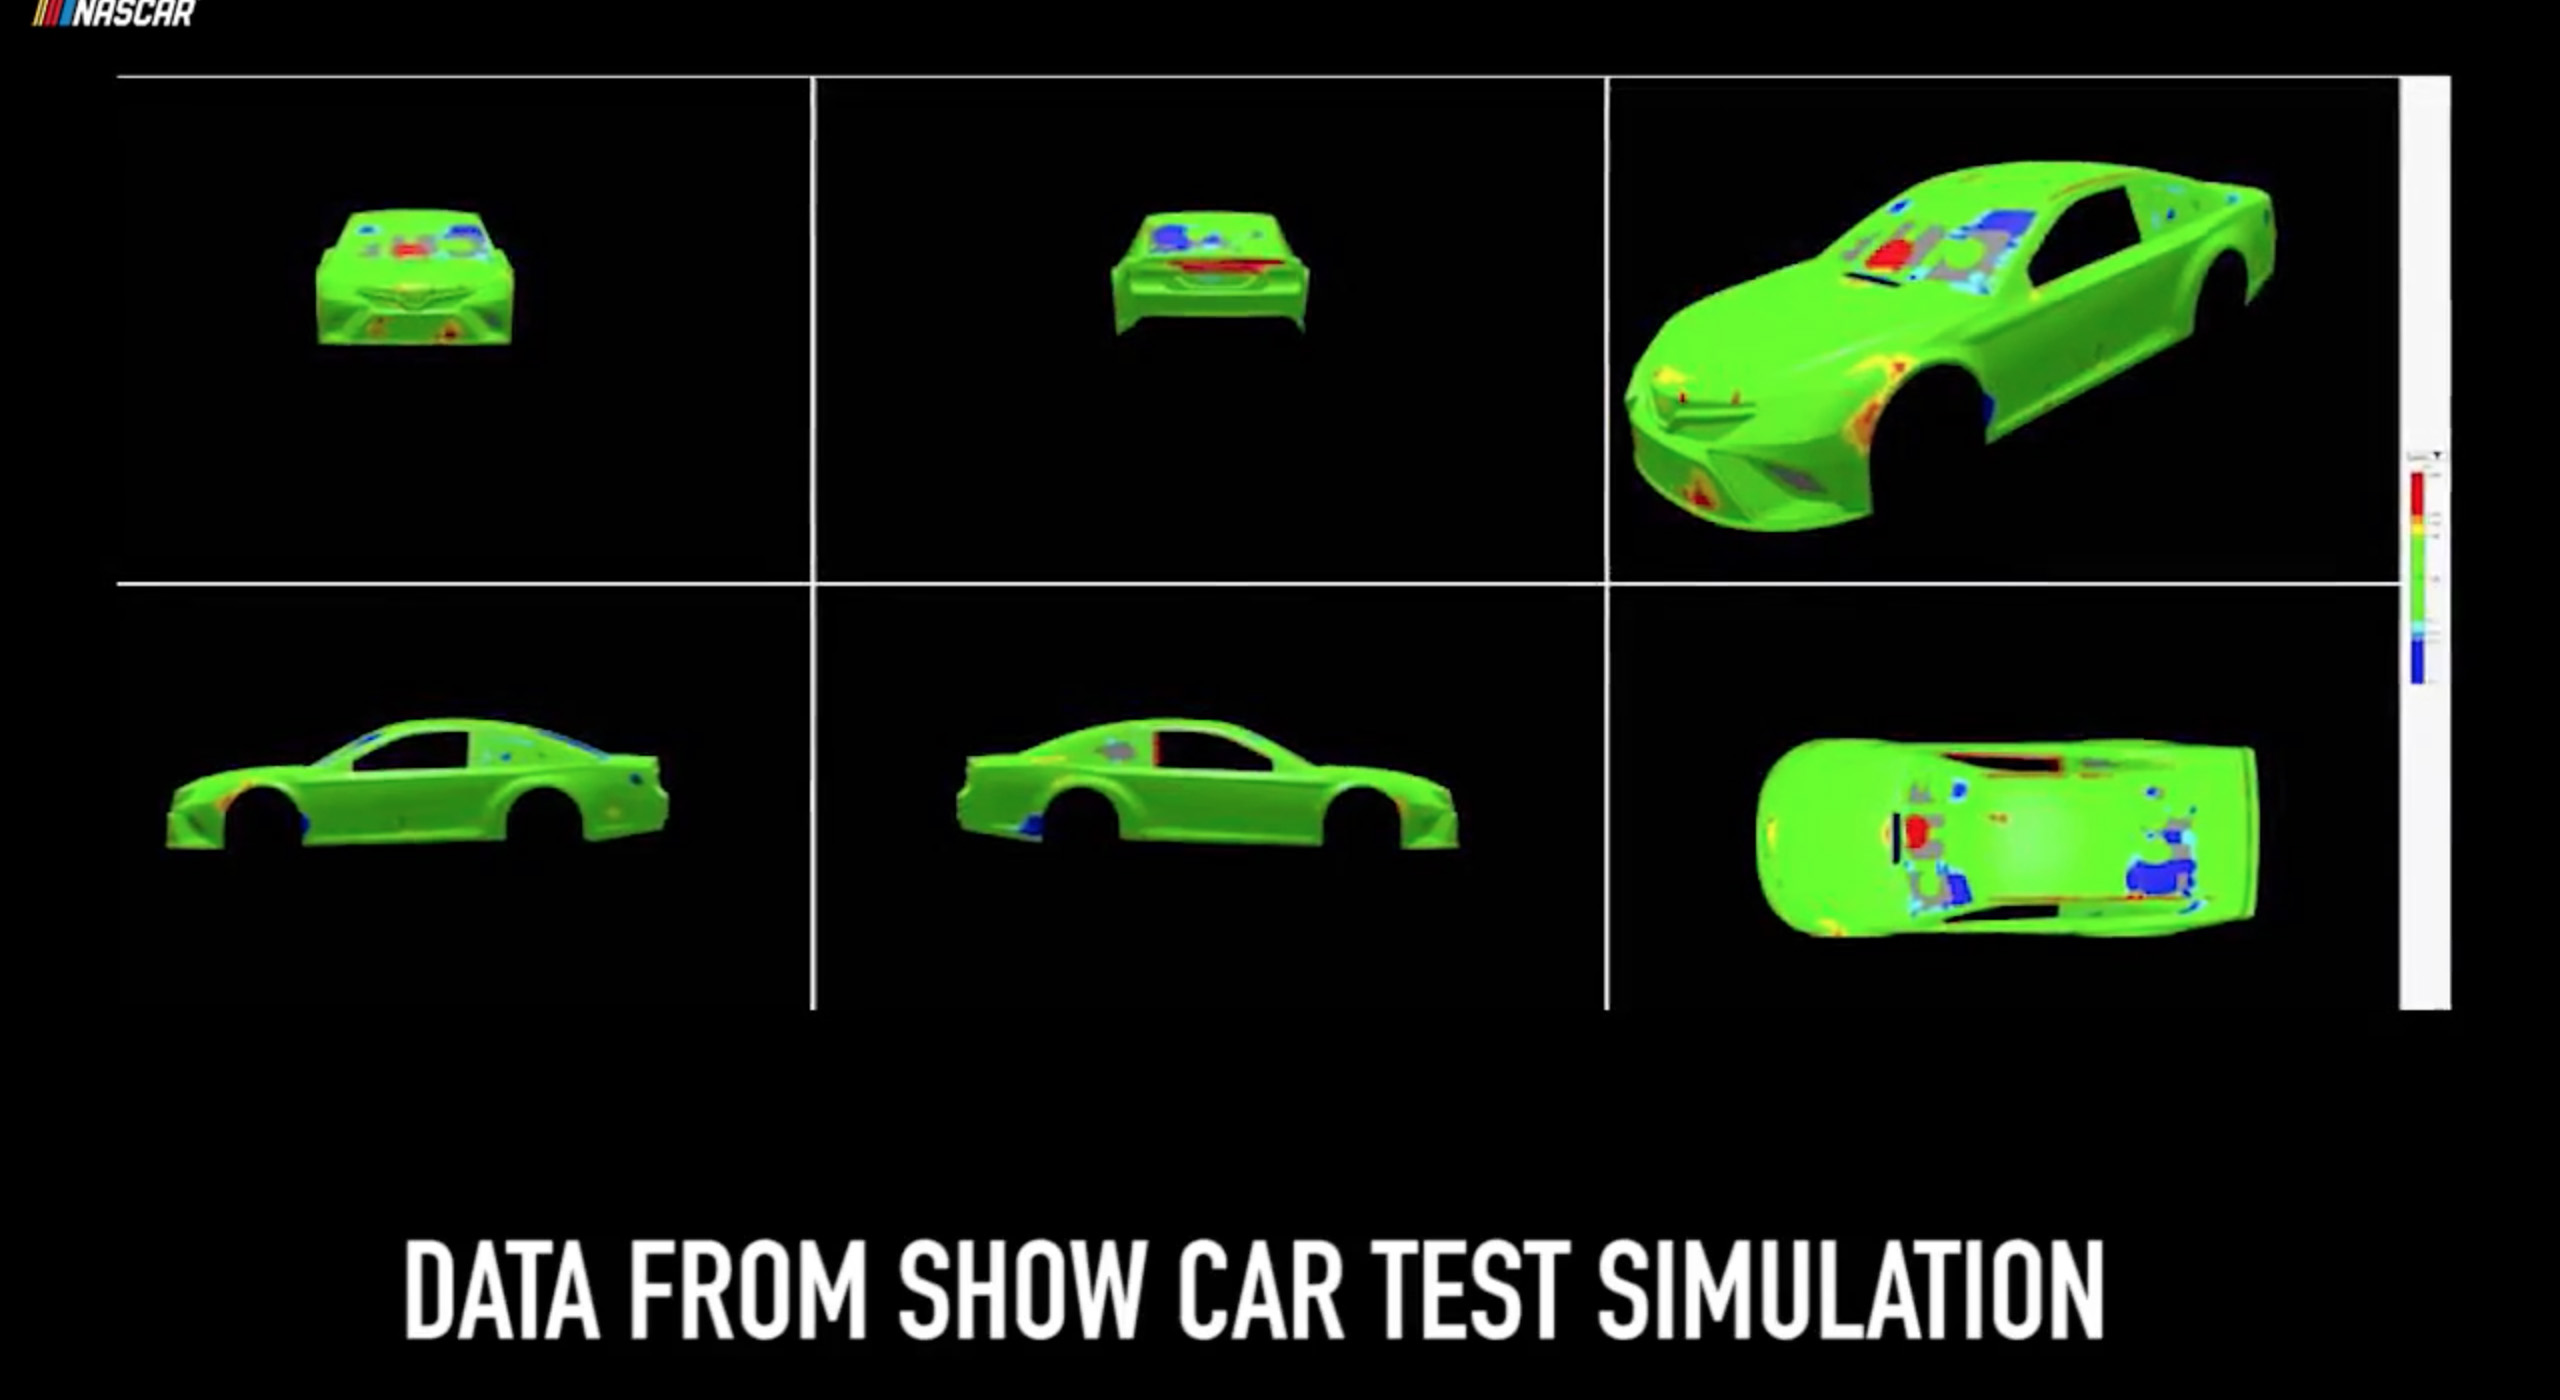 NASCAR inspection data screens